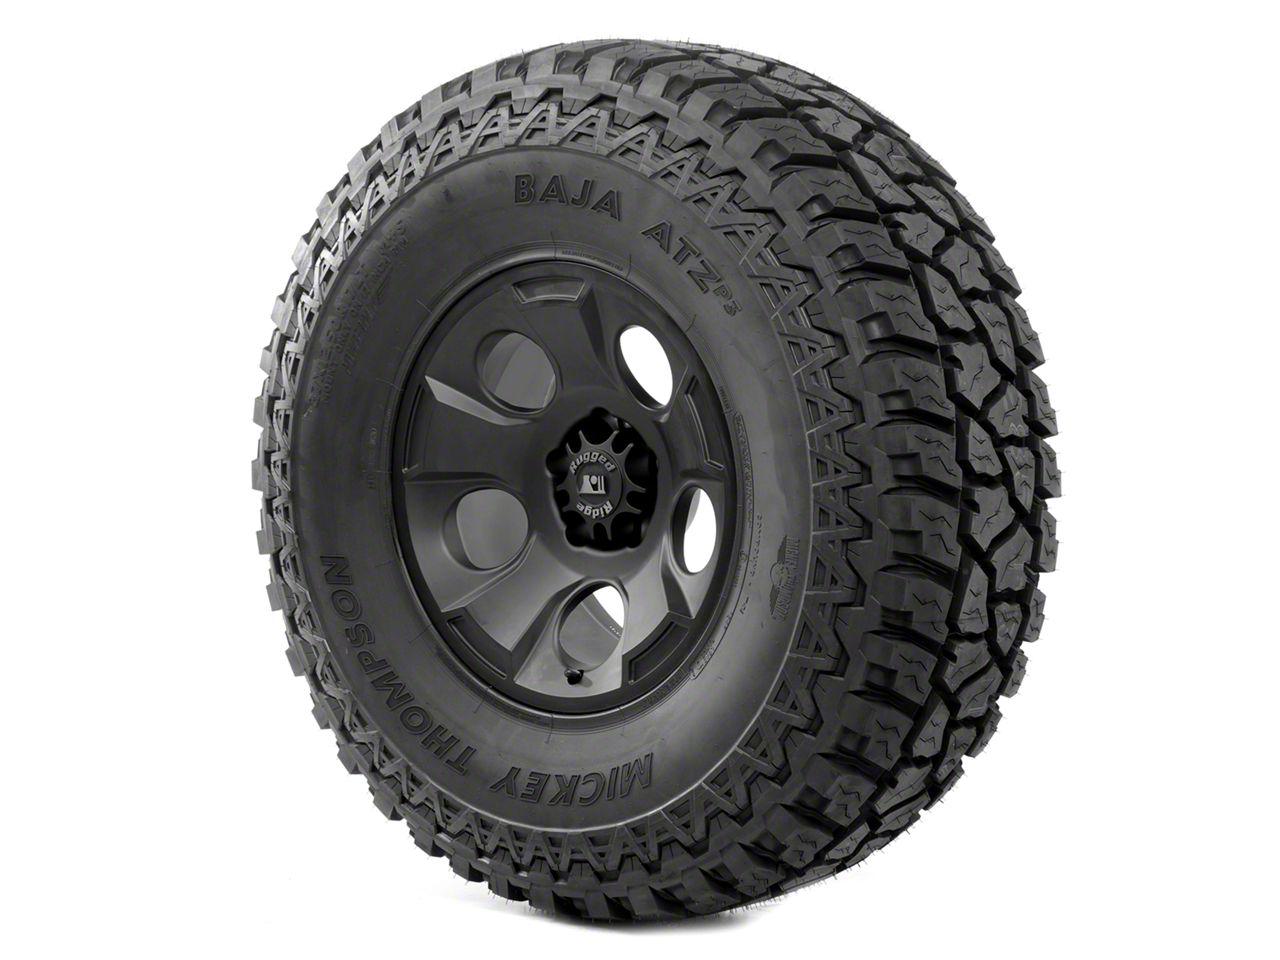 Rugged Ridge Drakon Wheel 17x9 Black Satin and Mickey Thompson ATZ P3 37x12.50x17 Tire Kit (07-18 Jeep Wrangler JK)